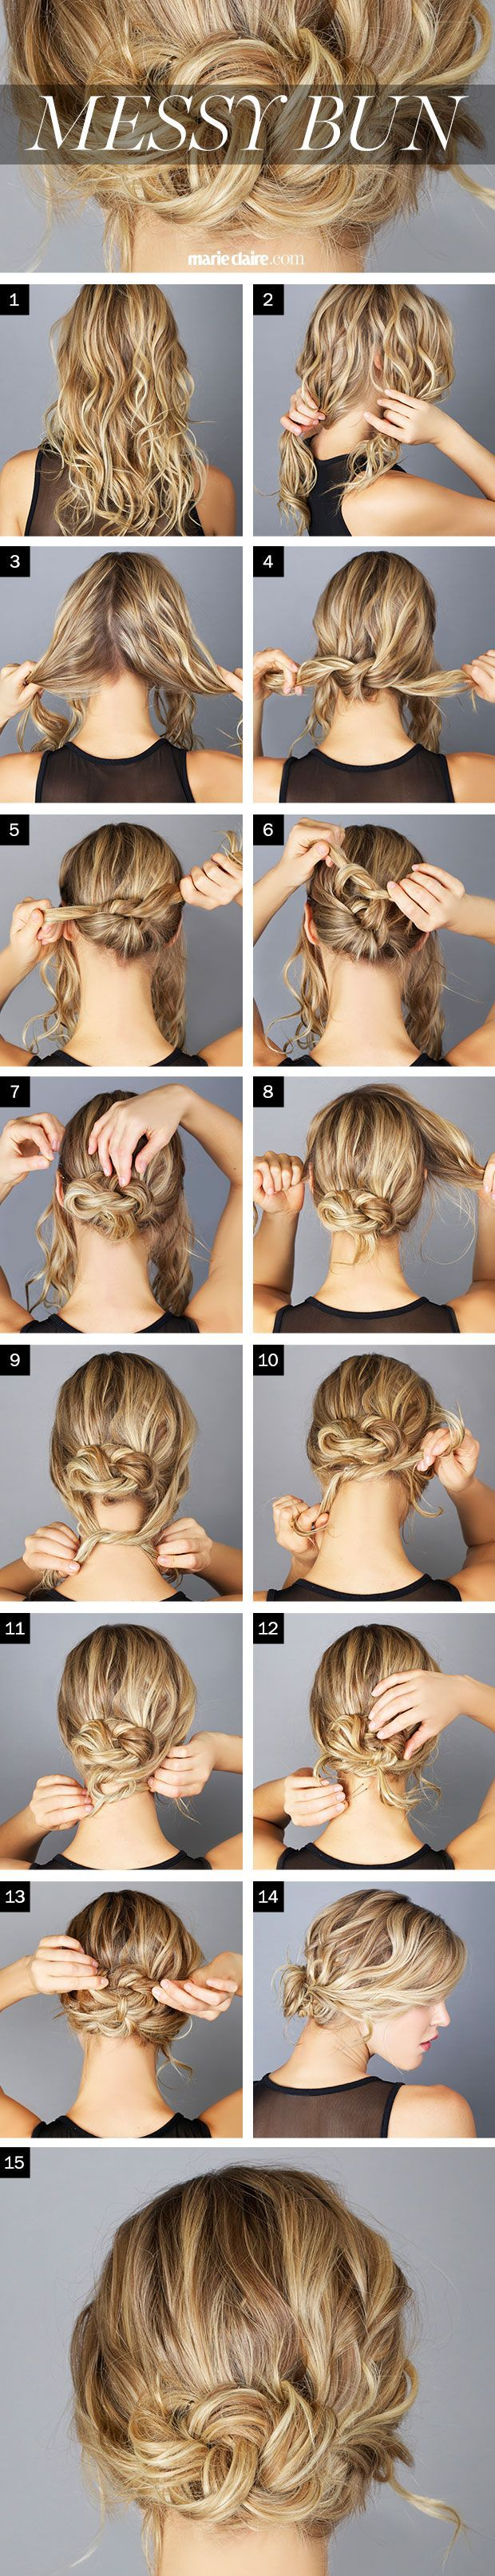 Messy Bun for Curls